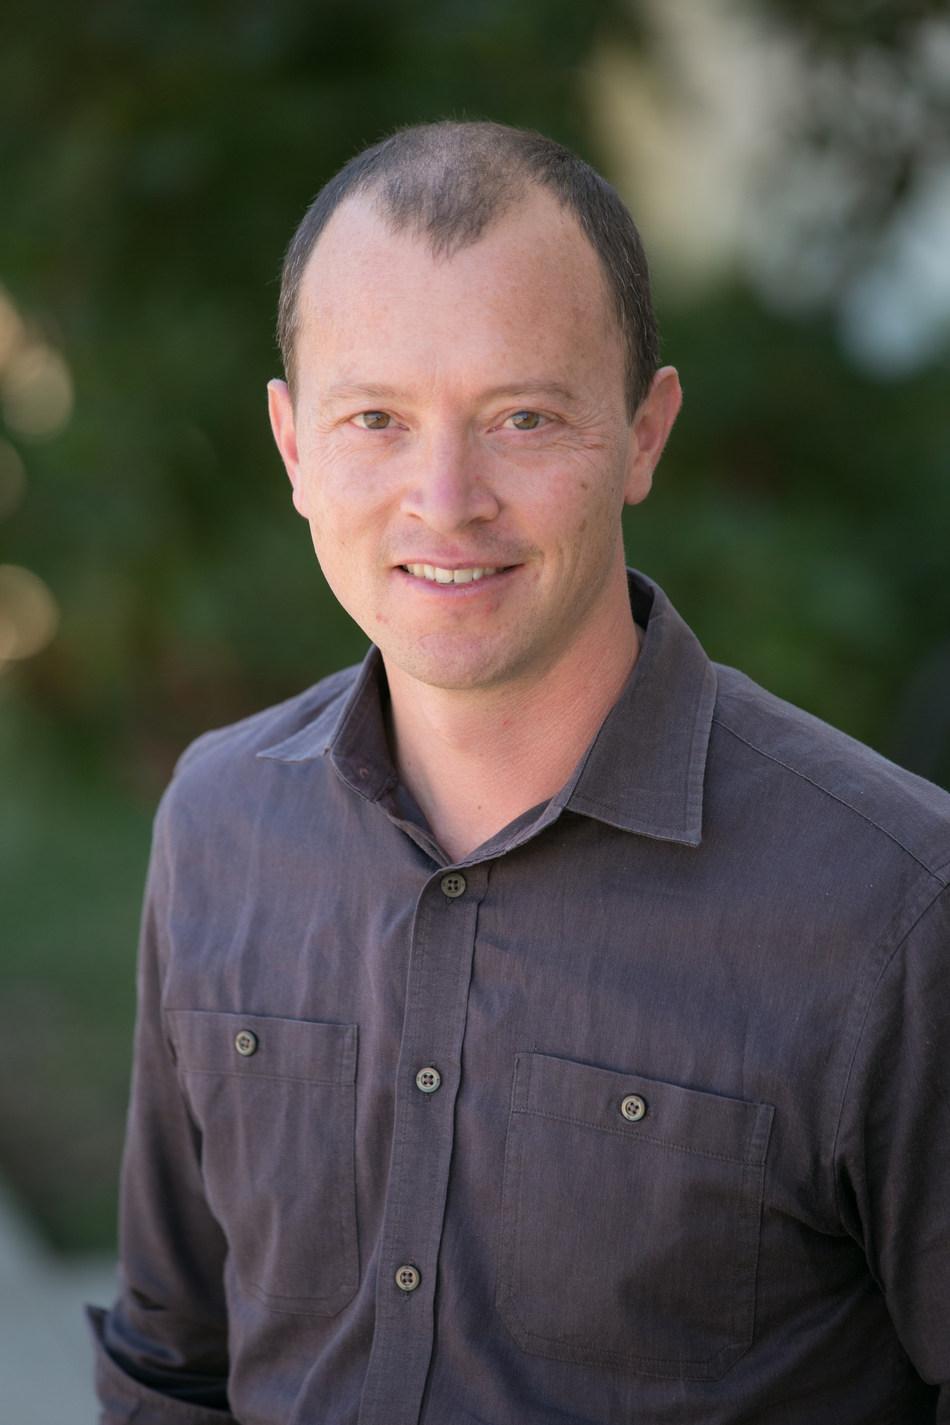 Lars Peters, Director of Business Development at EVgo